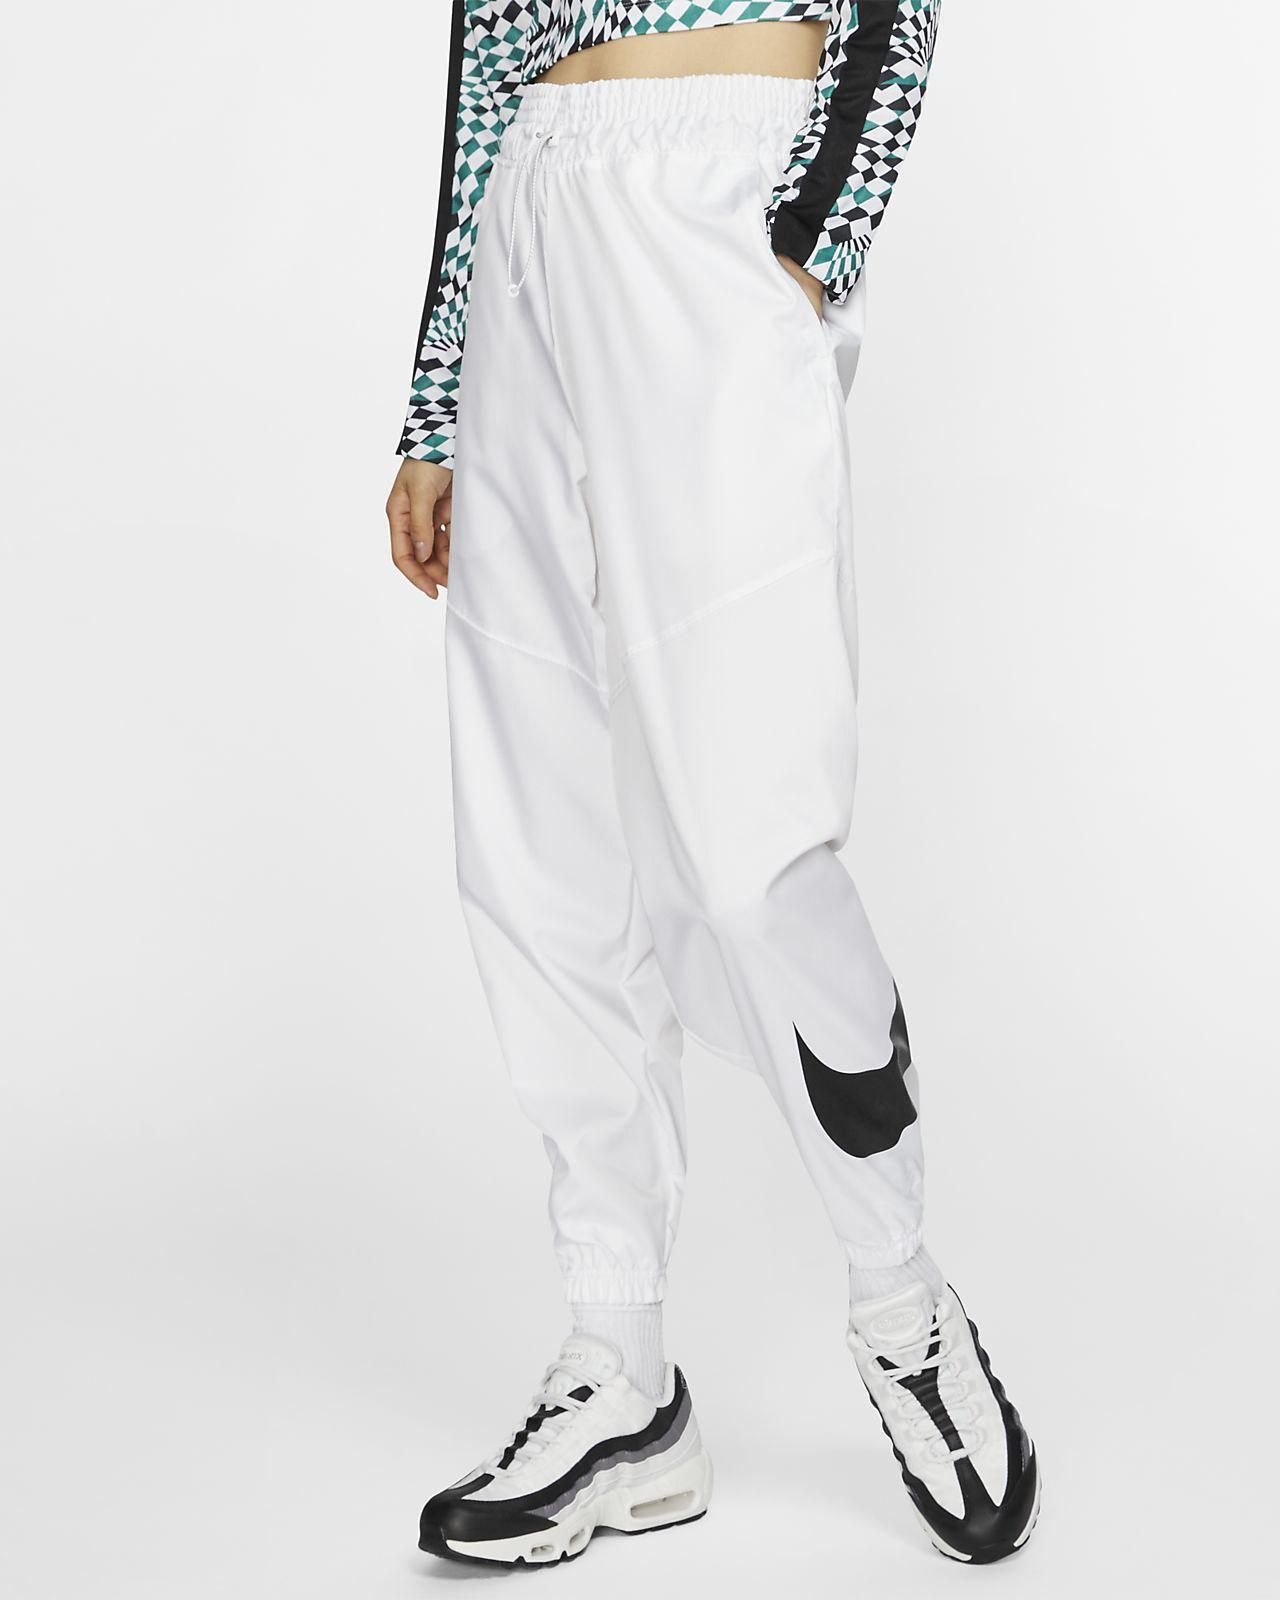 Nike Sportswear Swoosh Geweven broek